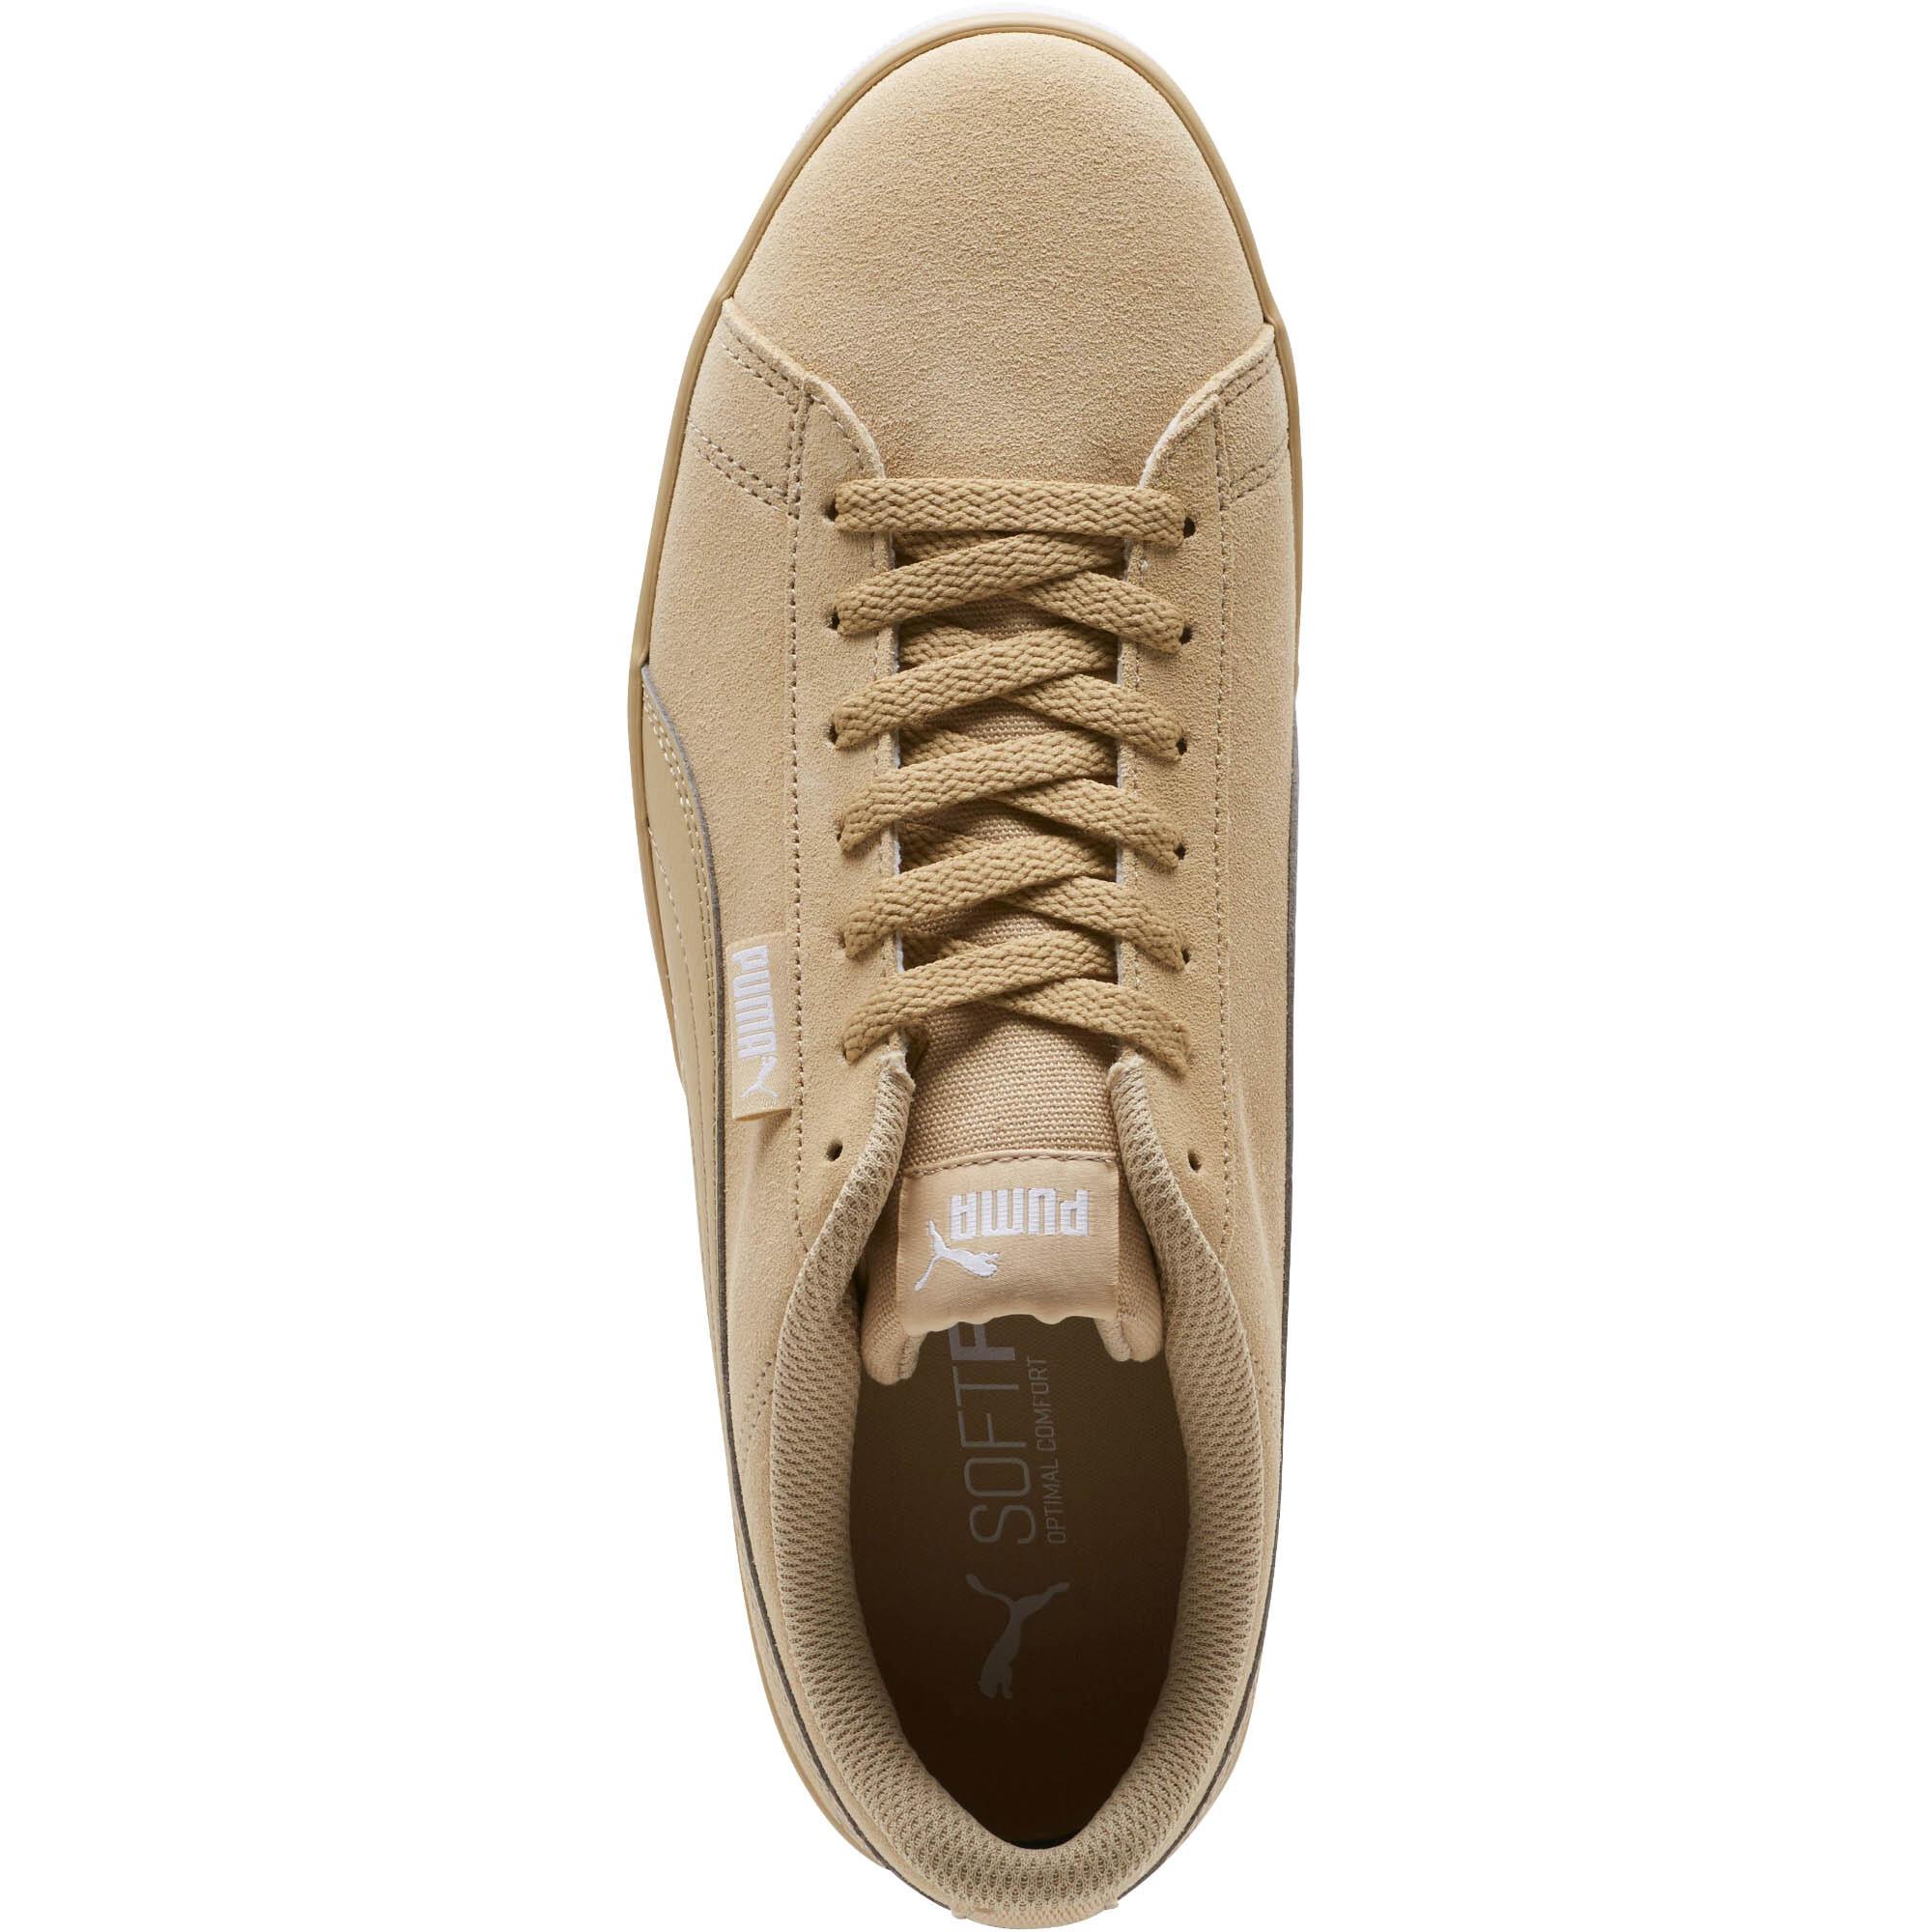 PUMA-Urban-Plus-Suede-Sneakers-Men-Shoe-Basics thumbnail 28